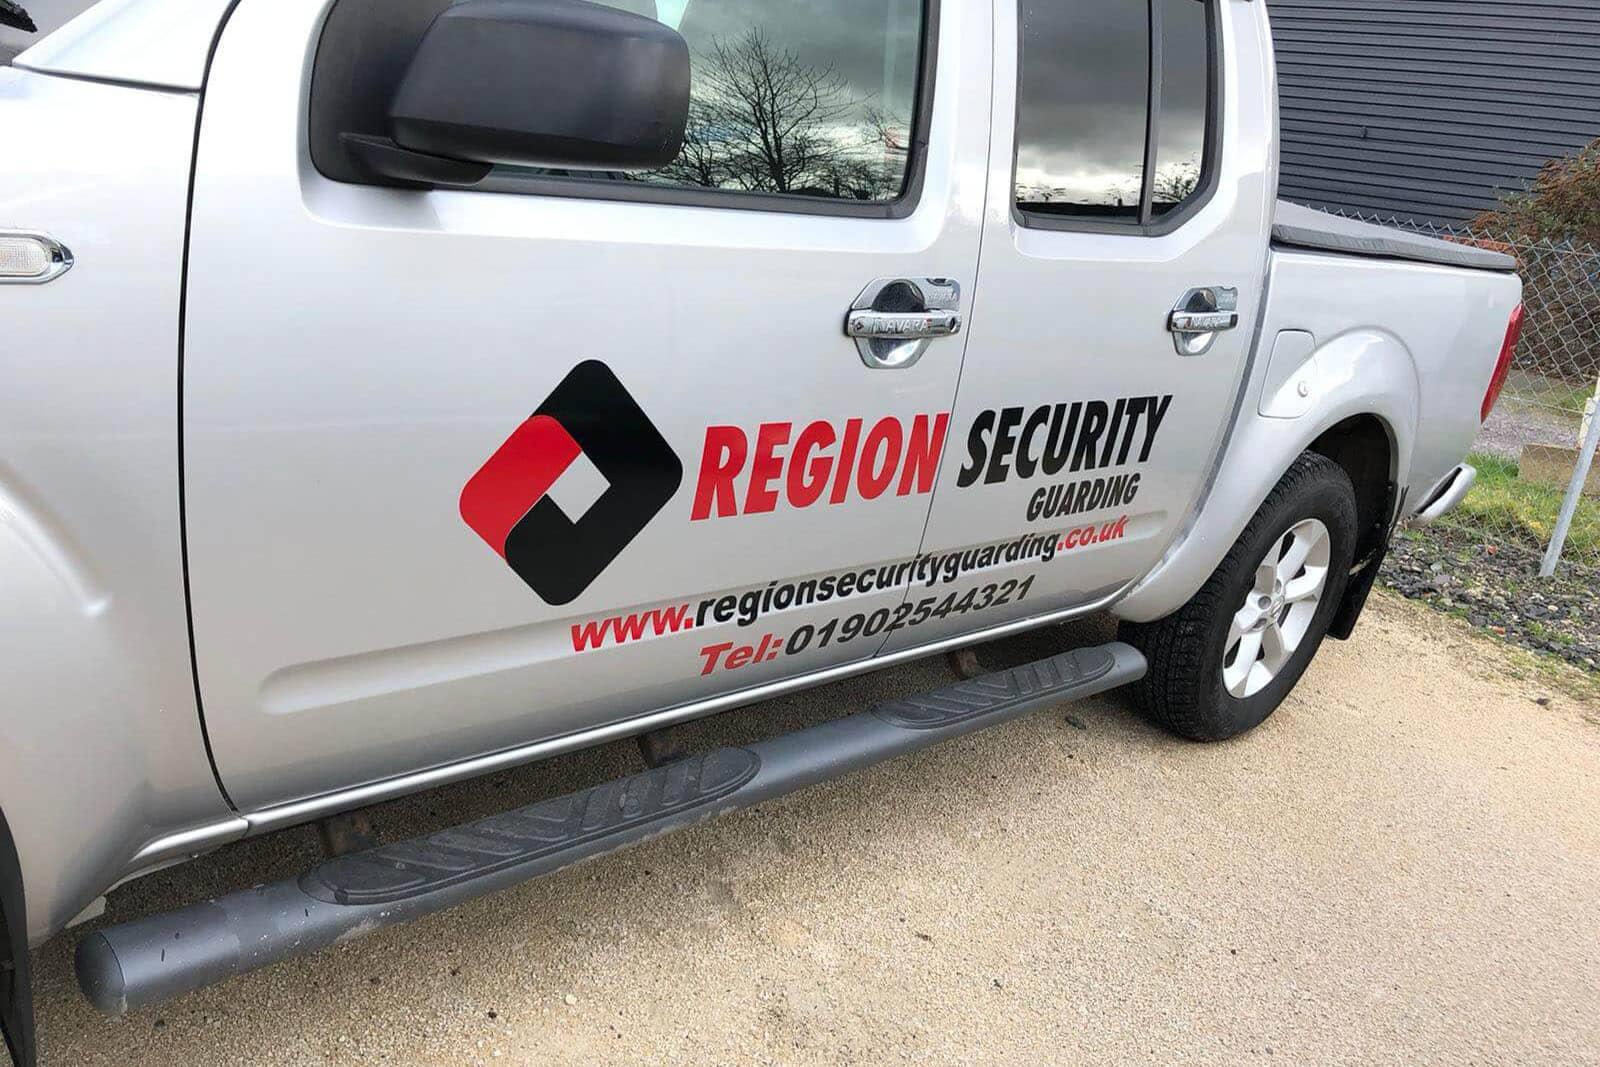 security-firms-hillingdon